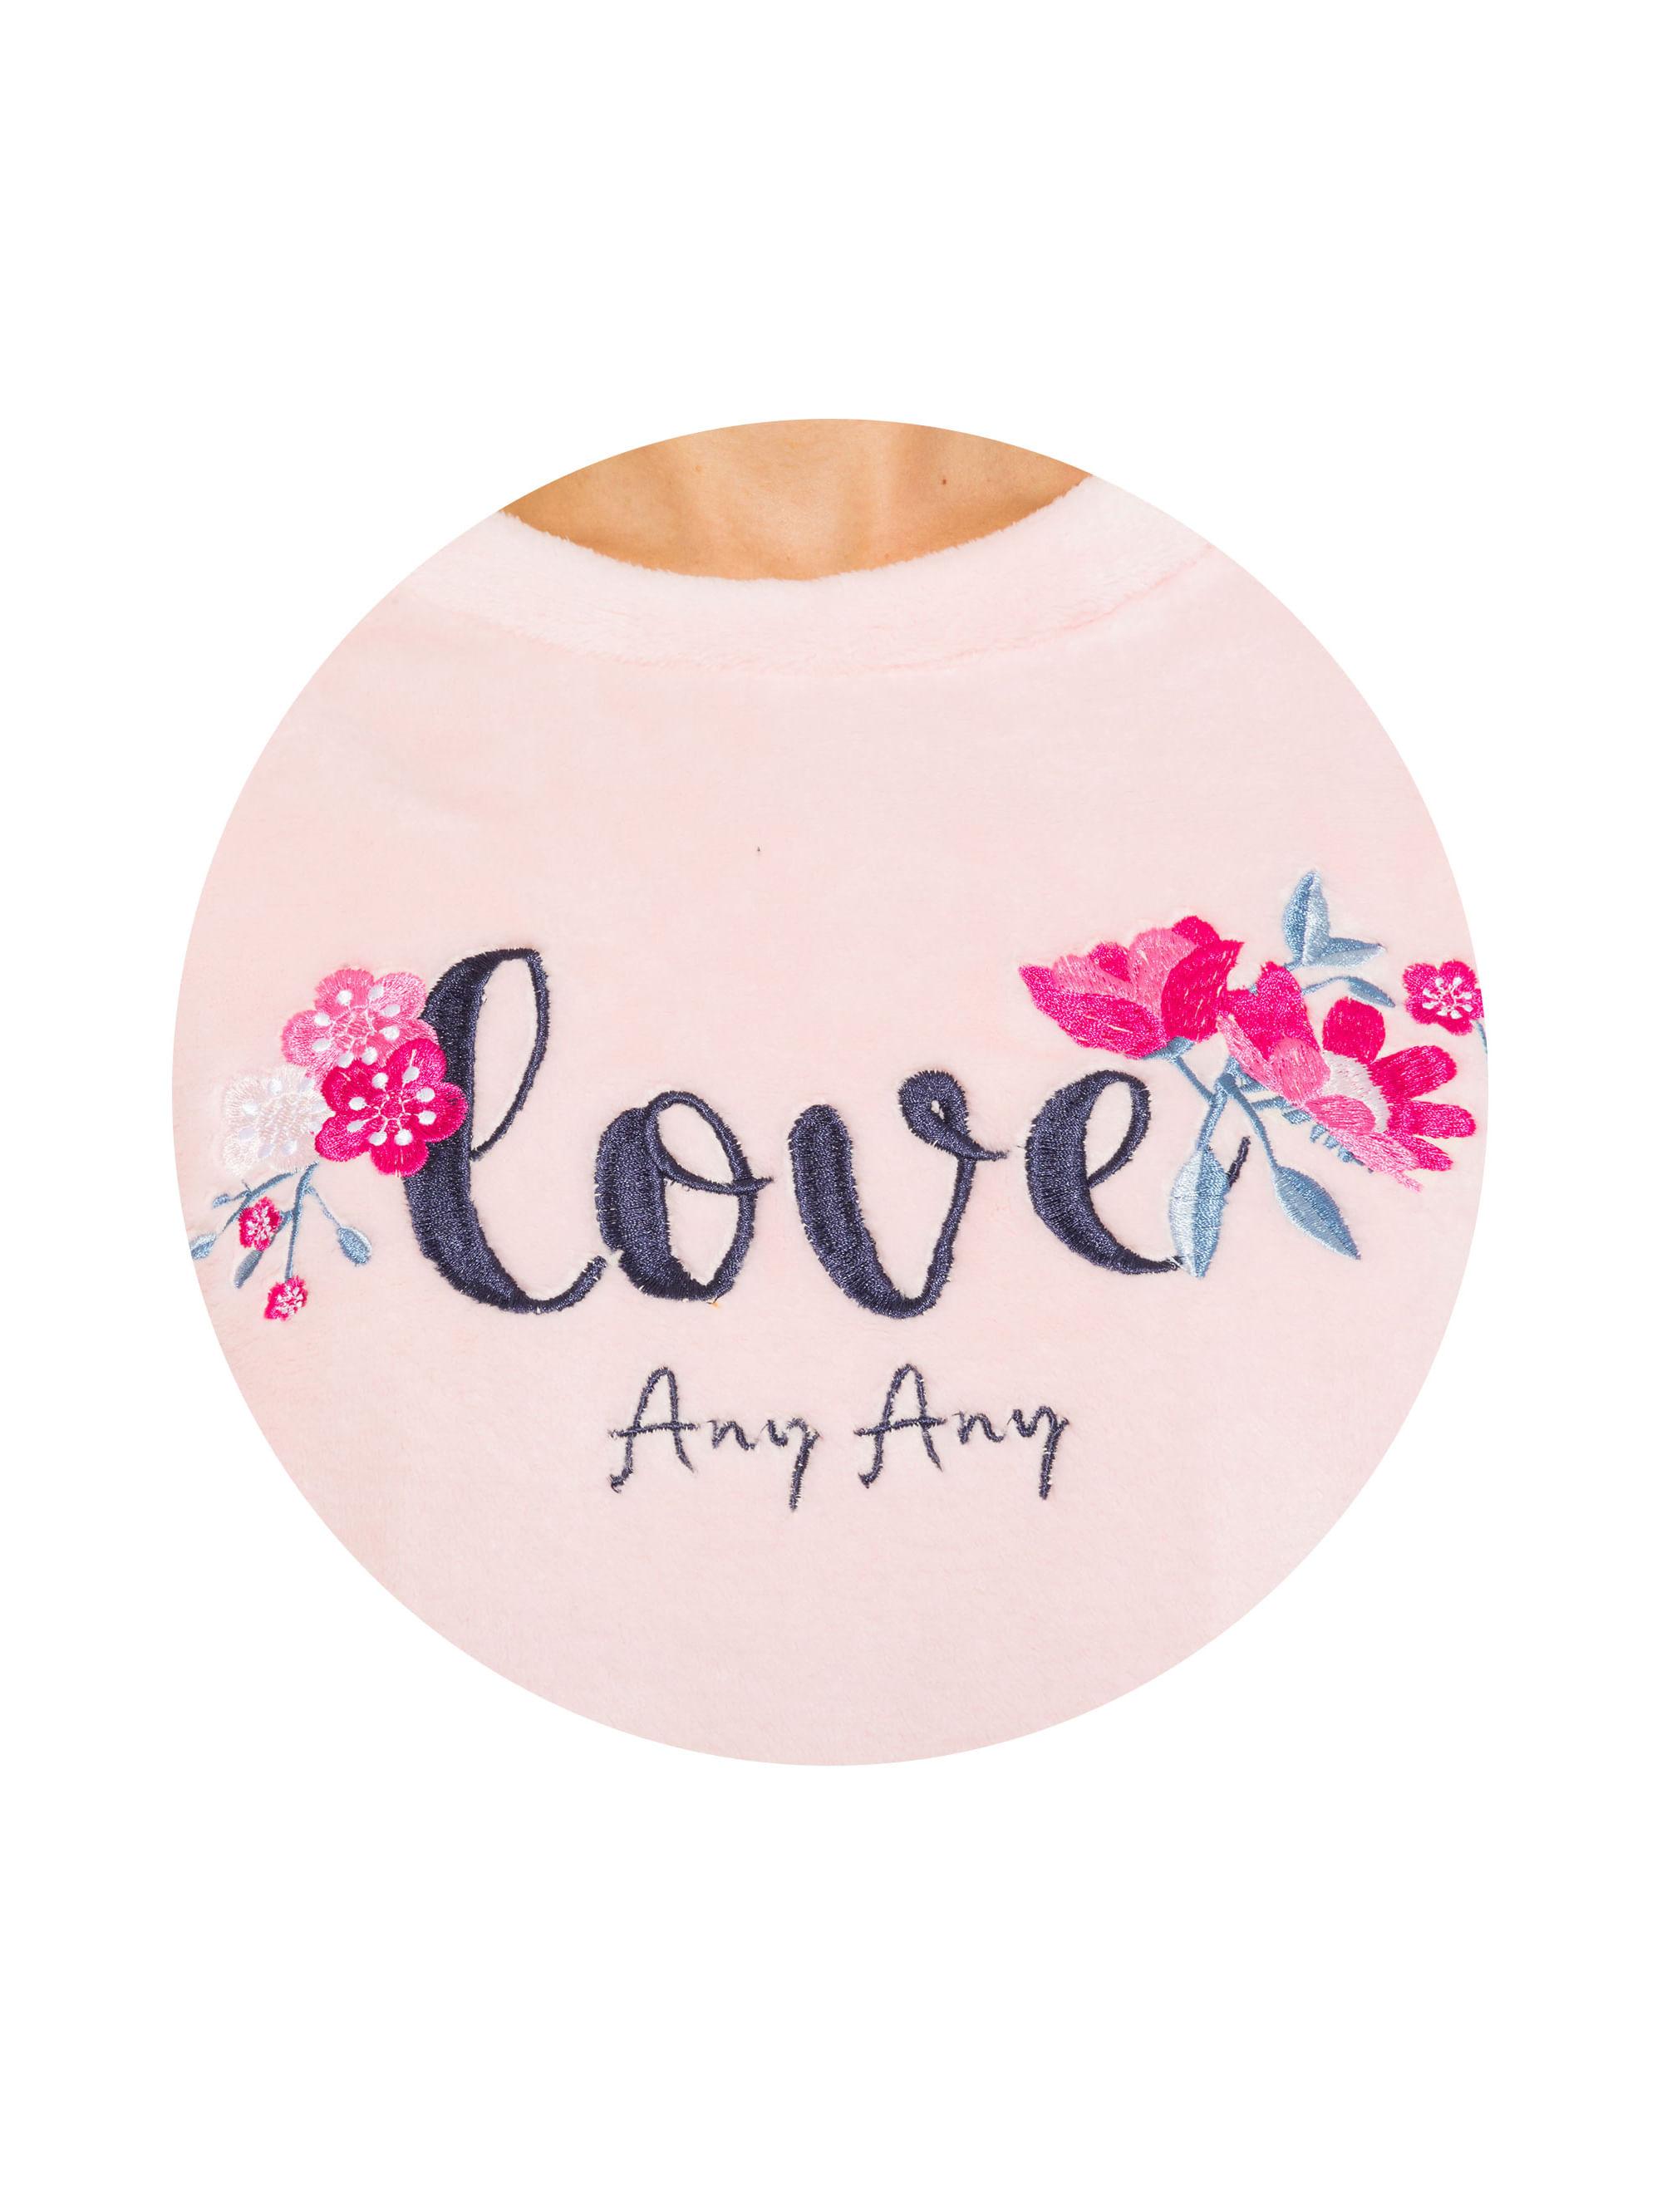 Pijama-Longo-Manga-Longa-Soft-Feminino-Love-Flowers-04.01.1501-Detalhes